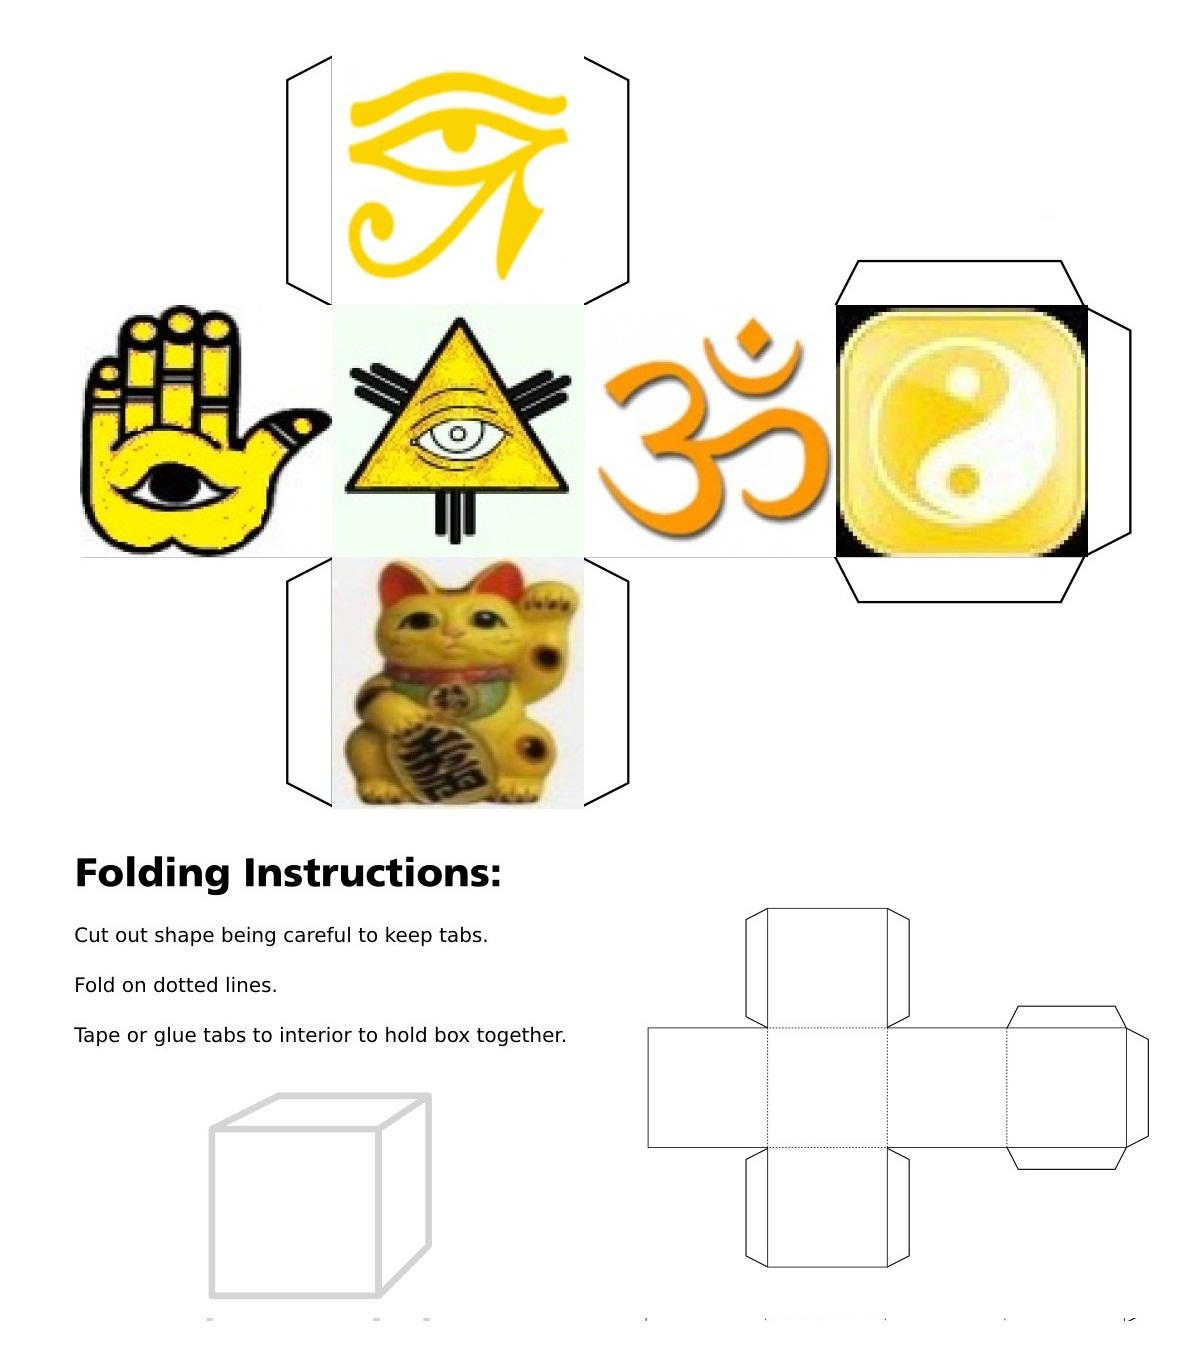 Cube, 3D Cube, Yellow Eye of Horus, Yellow Maneki Neko, Yellow Om, Yellow Ying Yang, Yellow Eye of Fatima, Yellow Eye of Providence